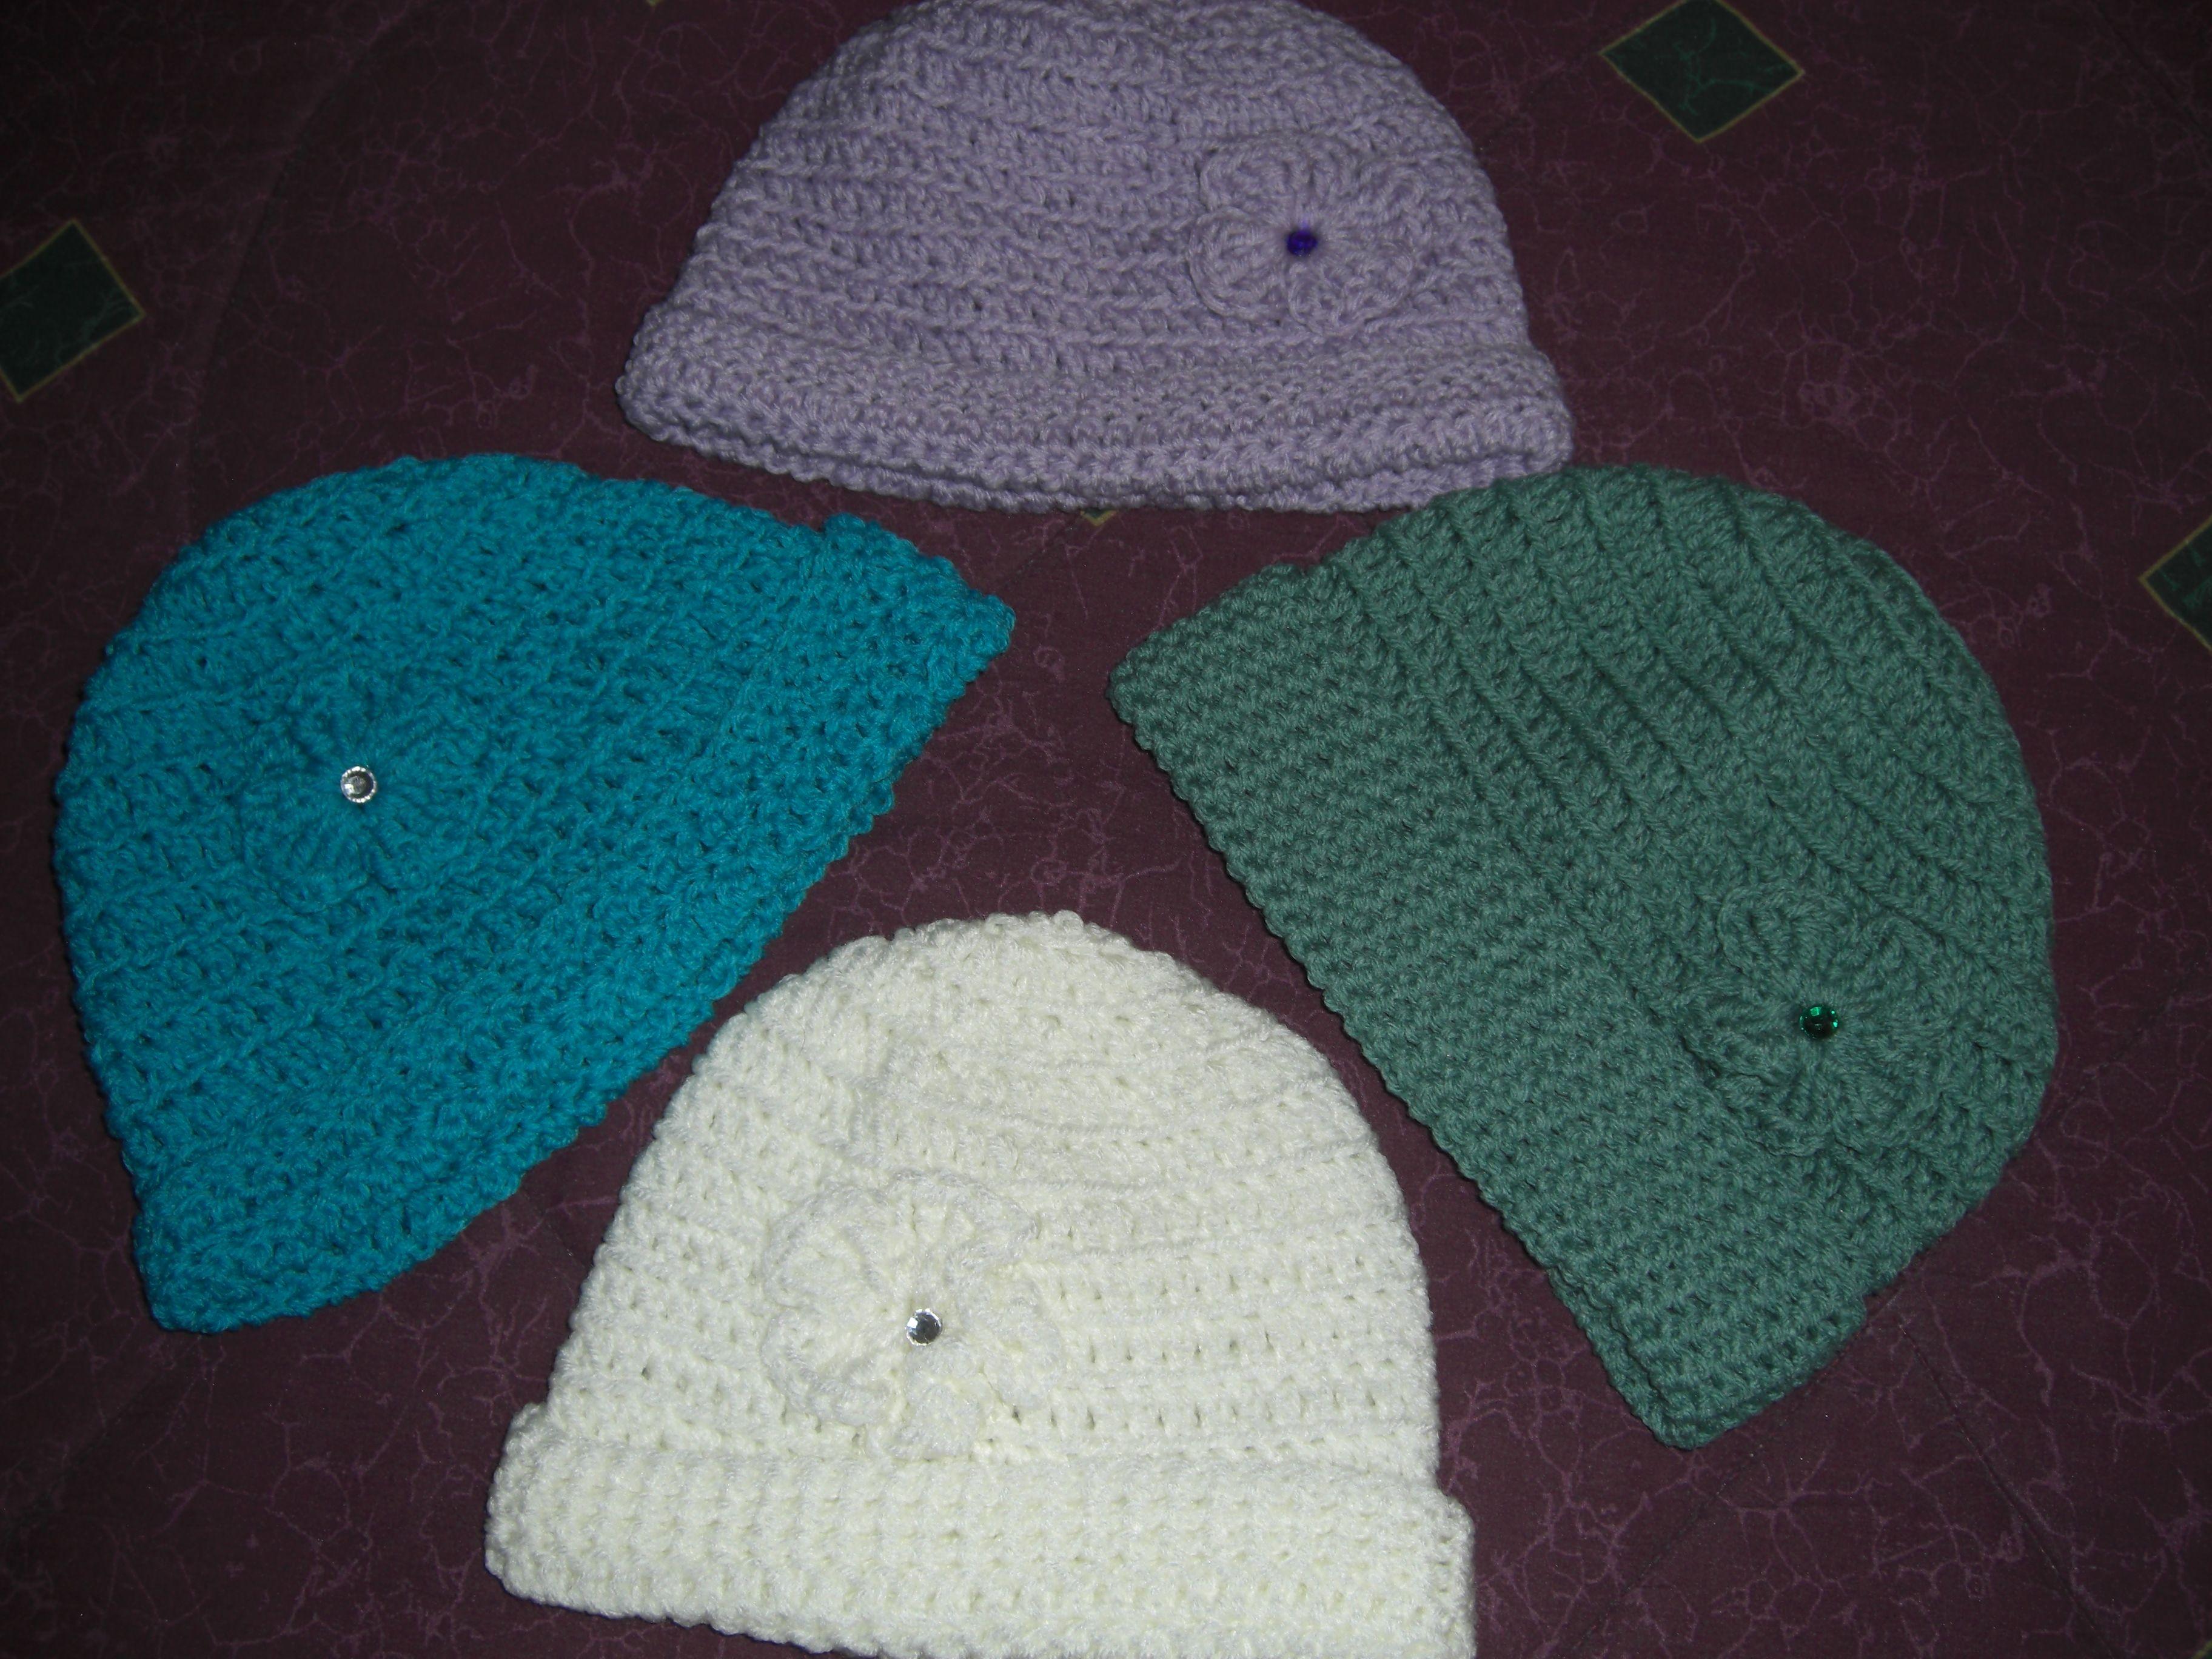 Crochet hats for Cancer patients Crochet Hats ...